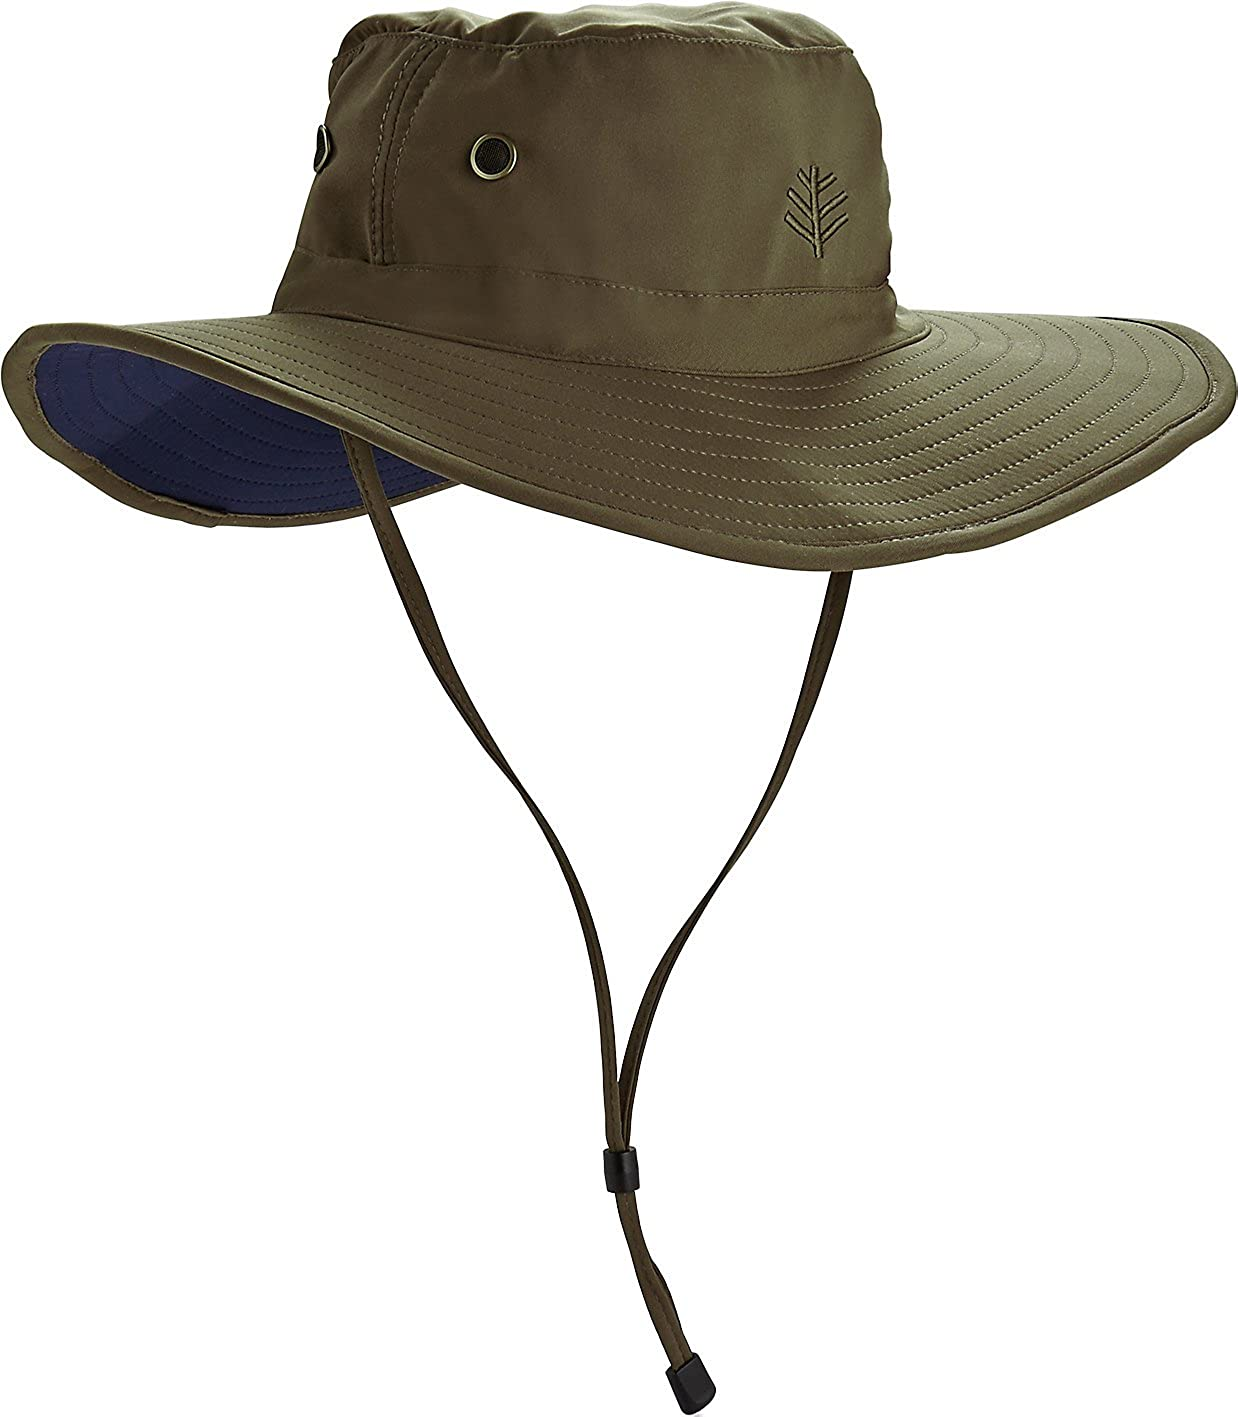 Coolibar UPF 50+ Men's Leo Shapeable Wide Brim Hat - Sun Protective